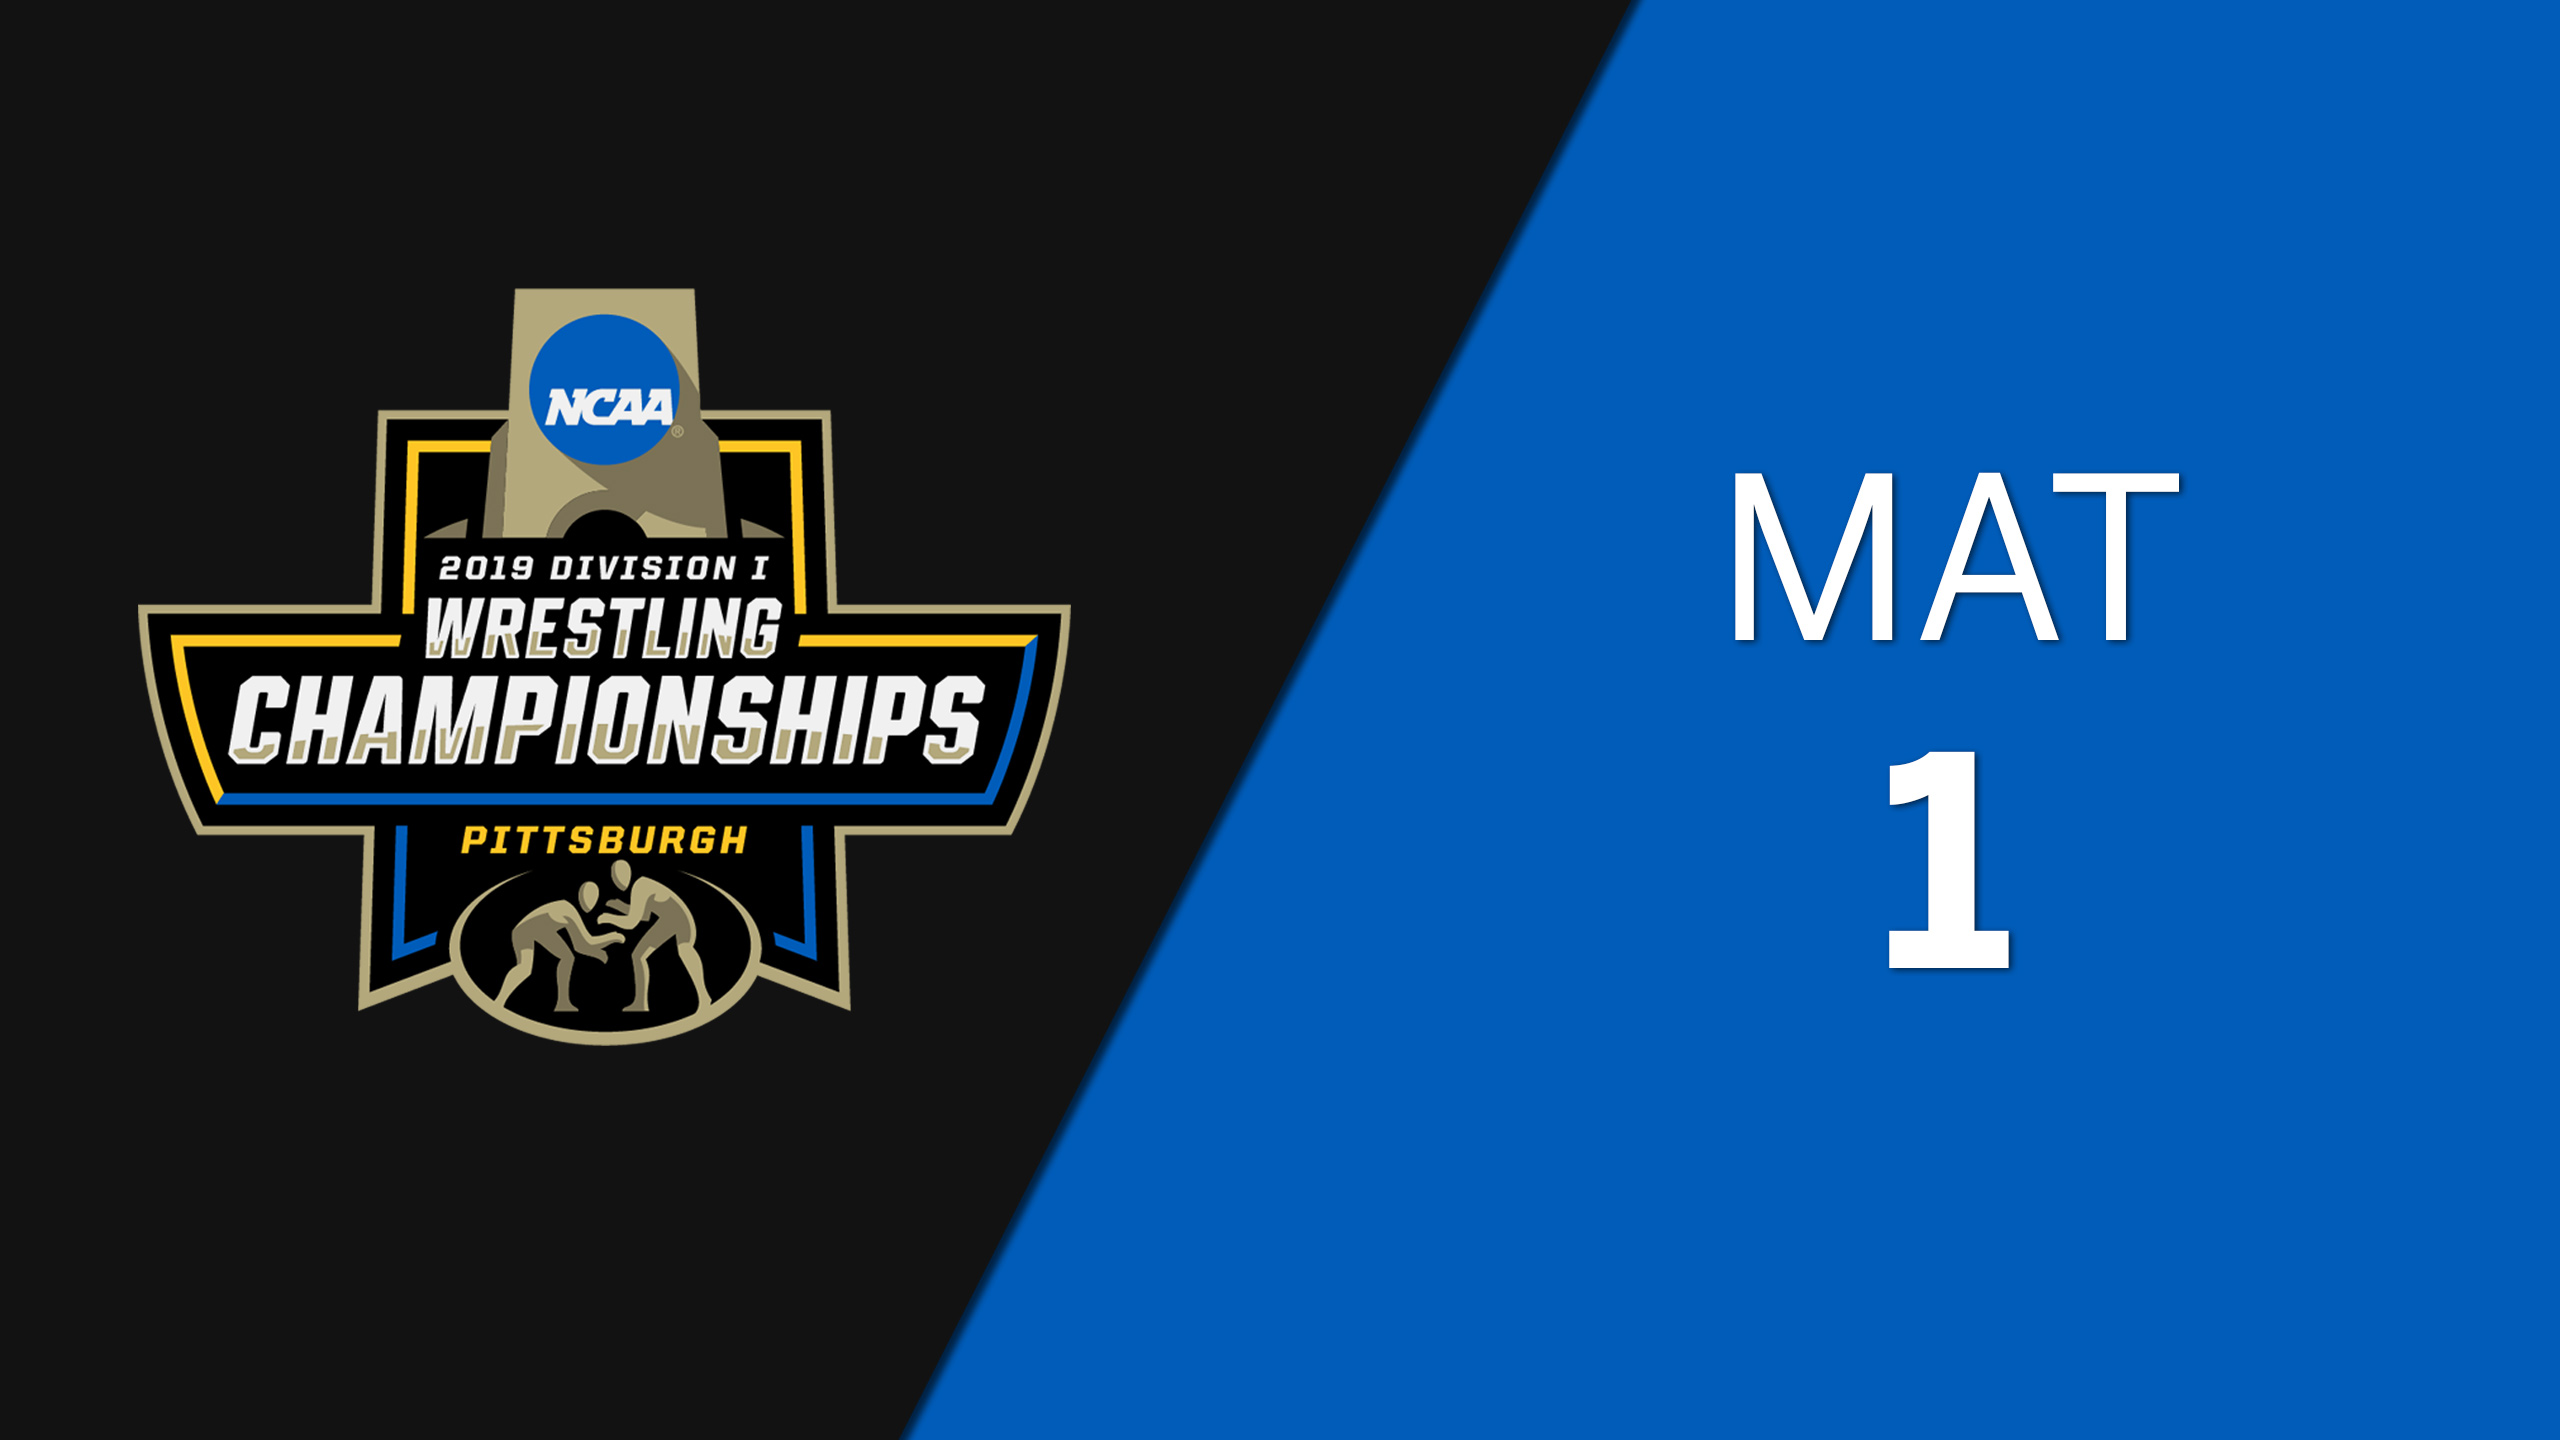 NCAA Wrestling Championship (Mat 1, Semifinals)